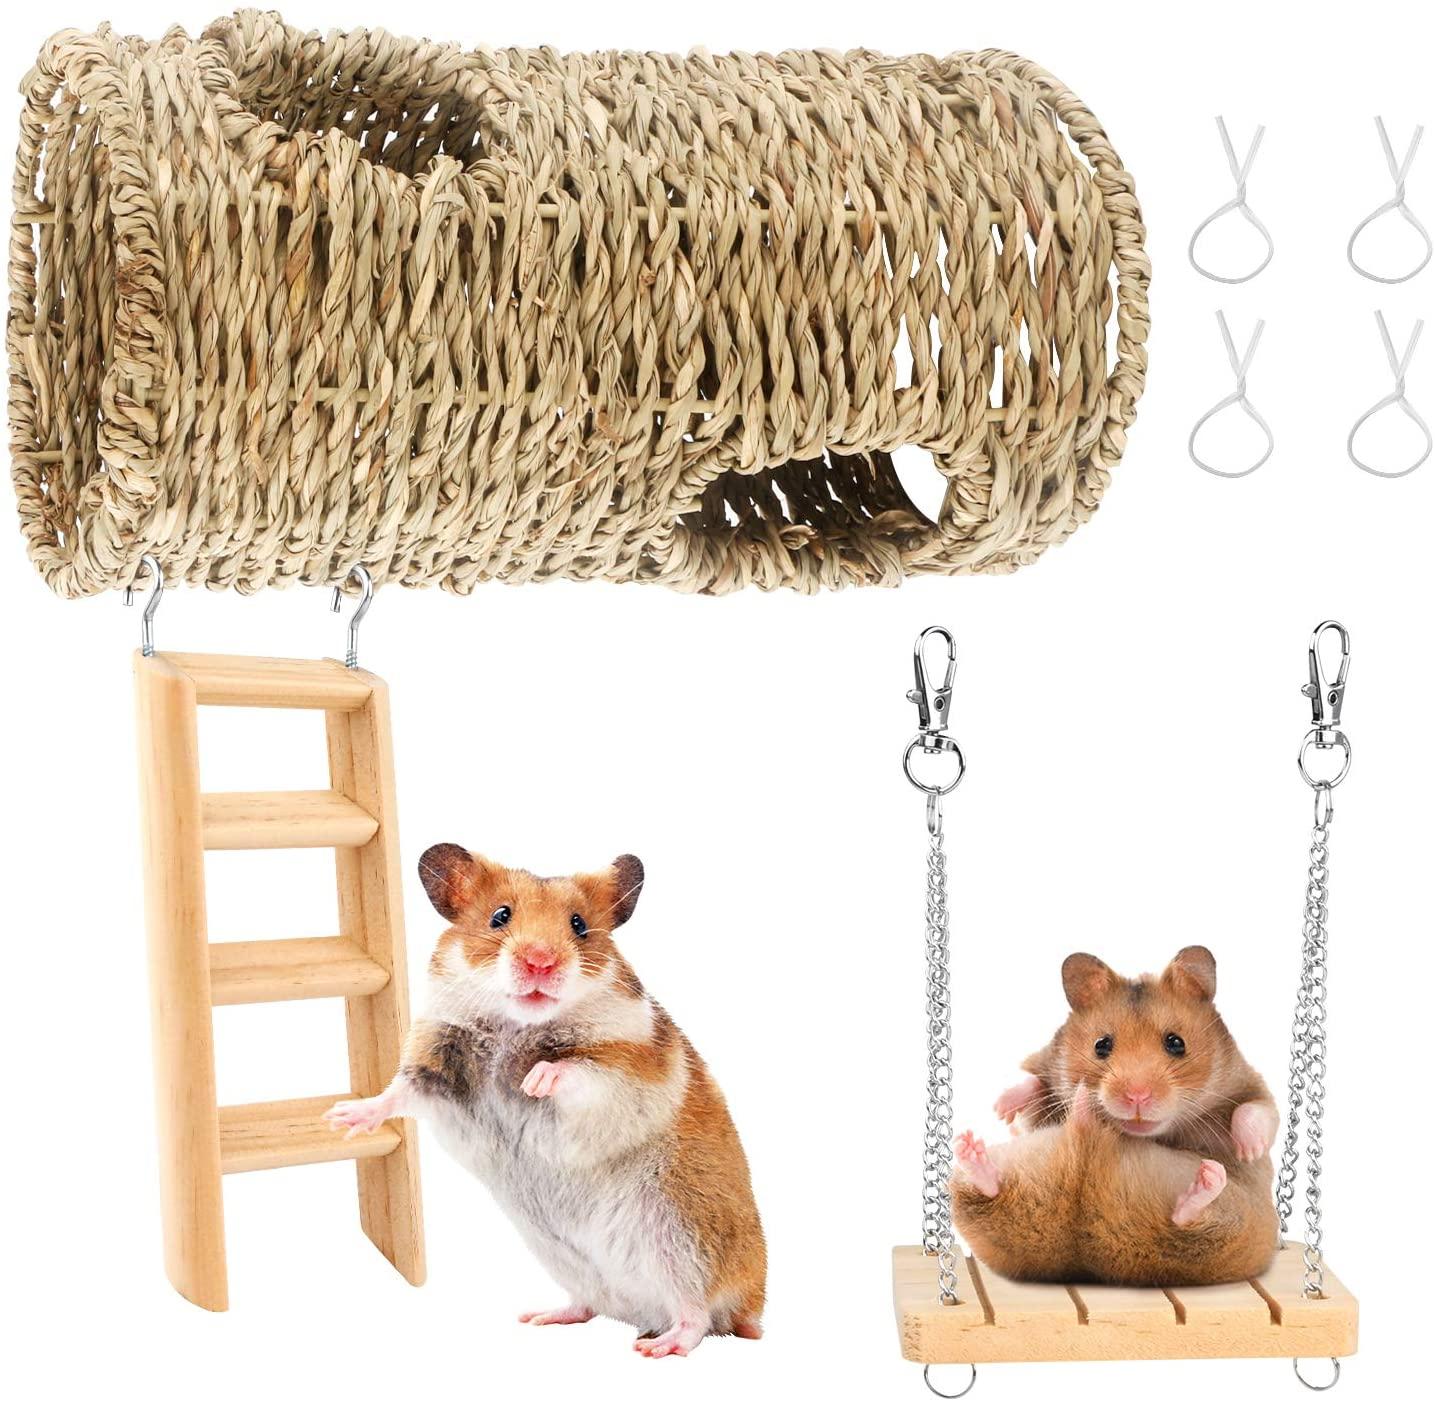 BSMTech Pet Hamster Hammock Hanging Toy Set, Small Pet Cage Hanging Chew Toy, Hamster Small Animal Chew Toy Molar Toy Hammock Ladder Bridge Swing for Sugar Glider Squirrel Chinchilla Hamster Rat